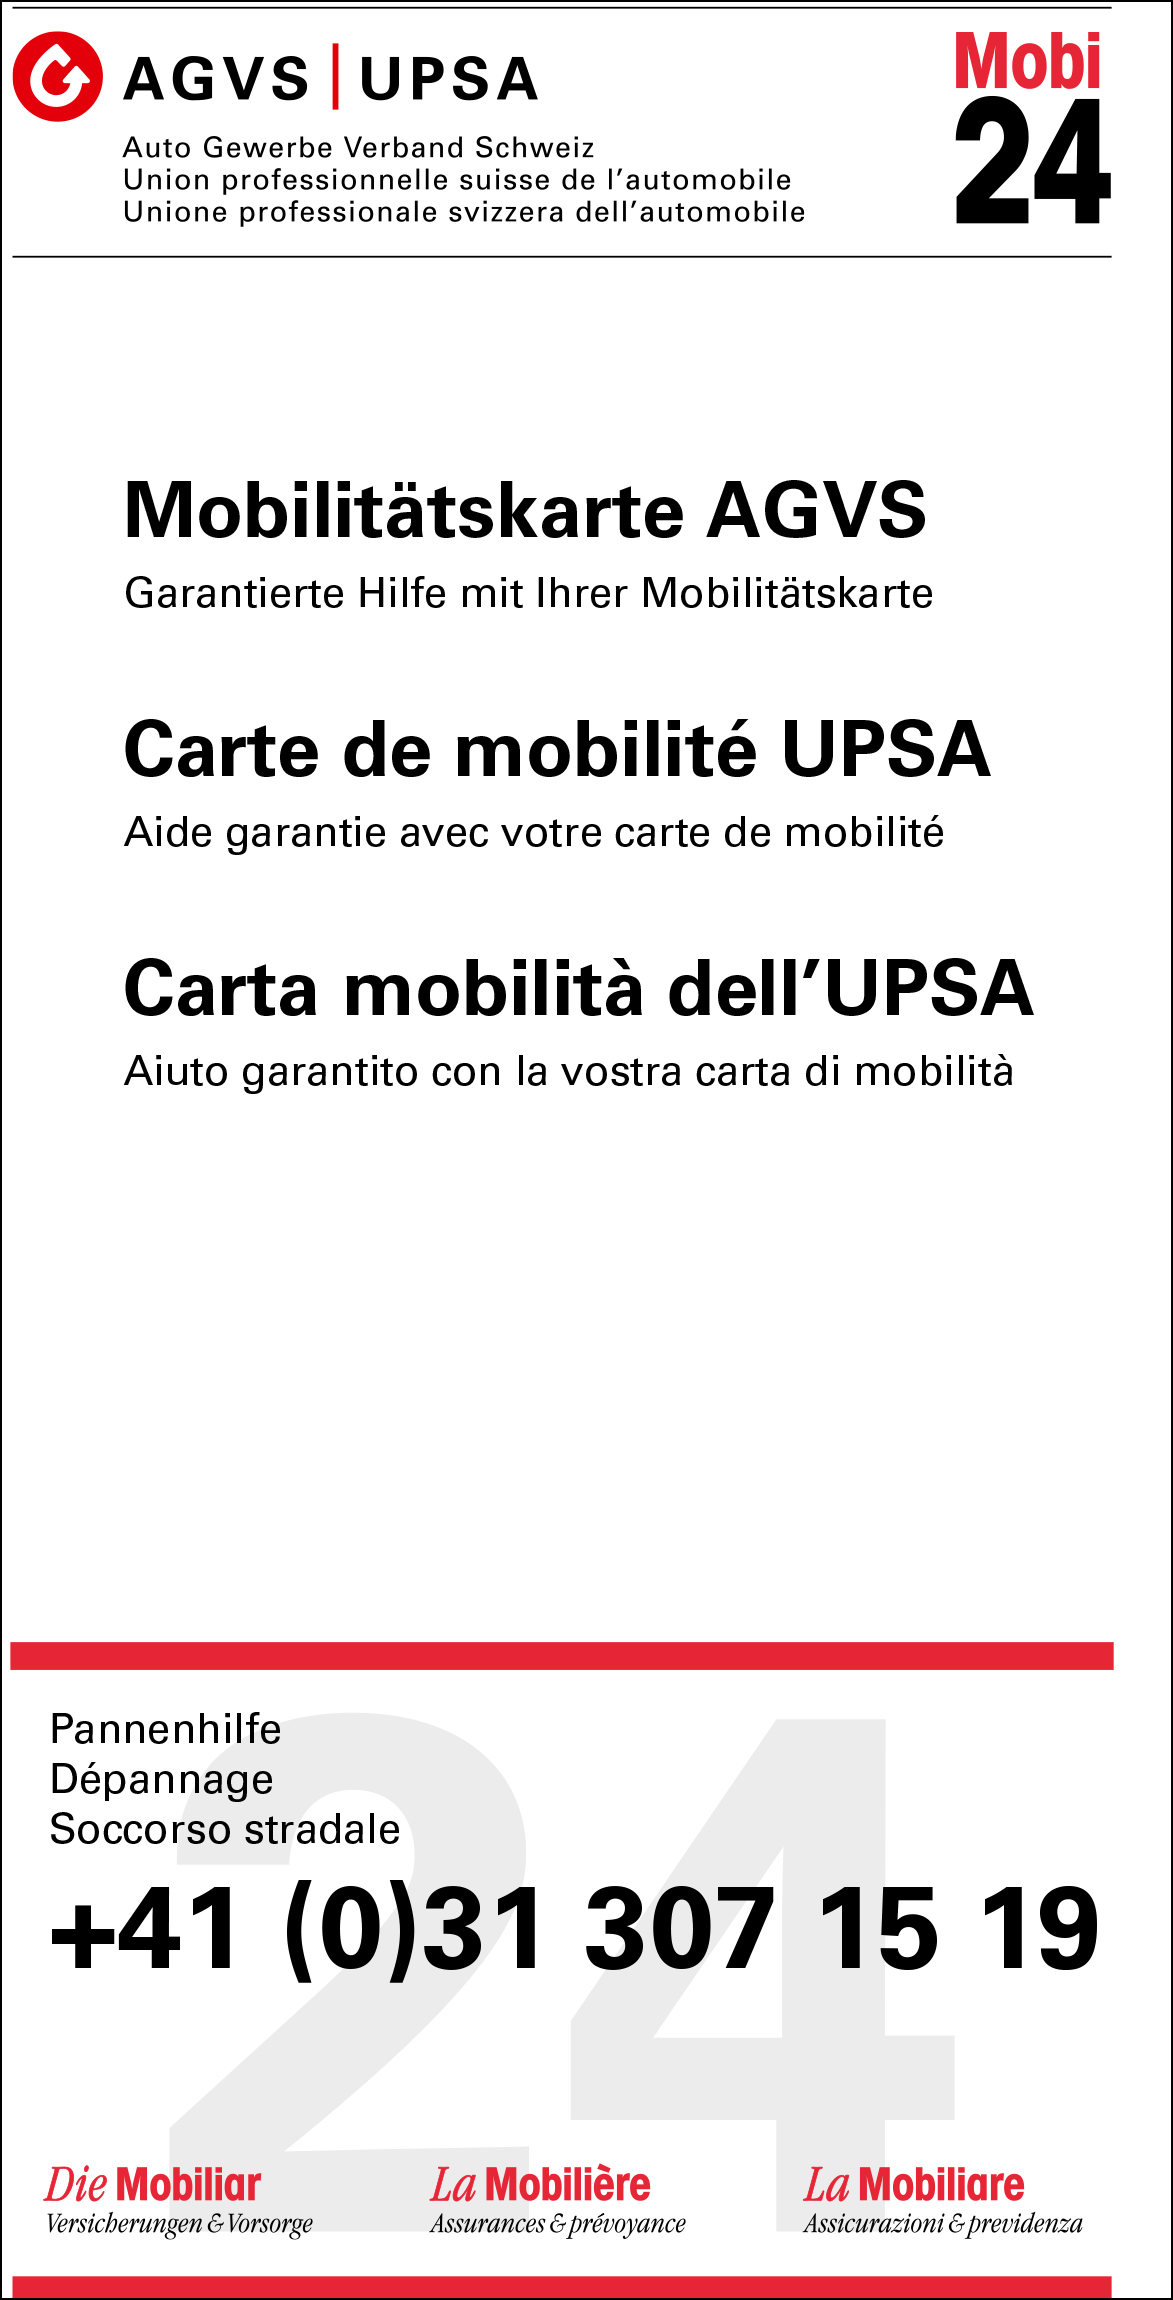 Iframe | AGVS | UPSA - Sektion Bern